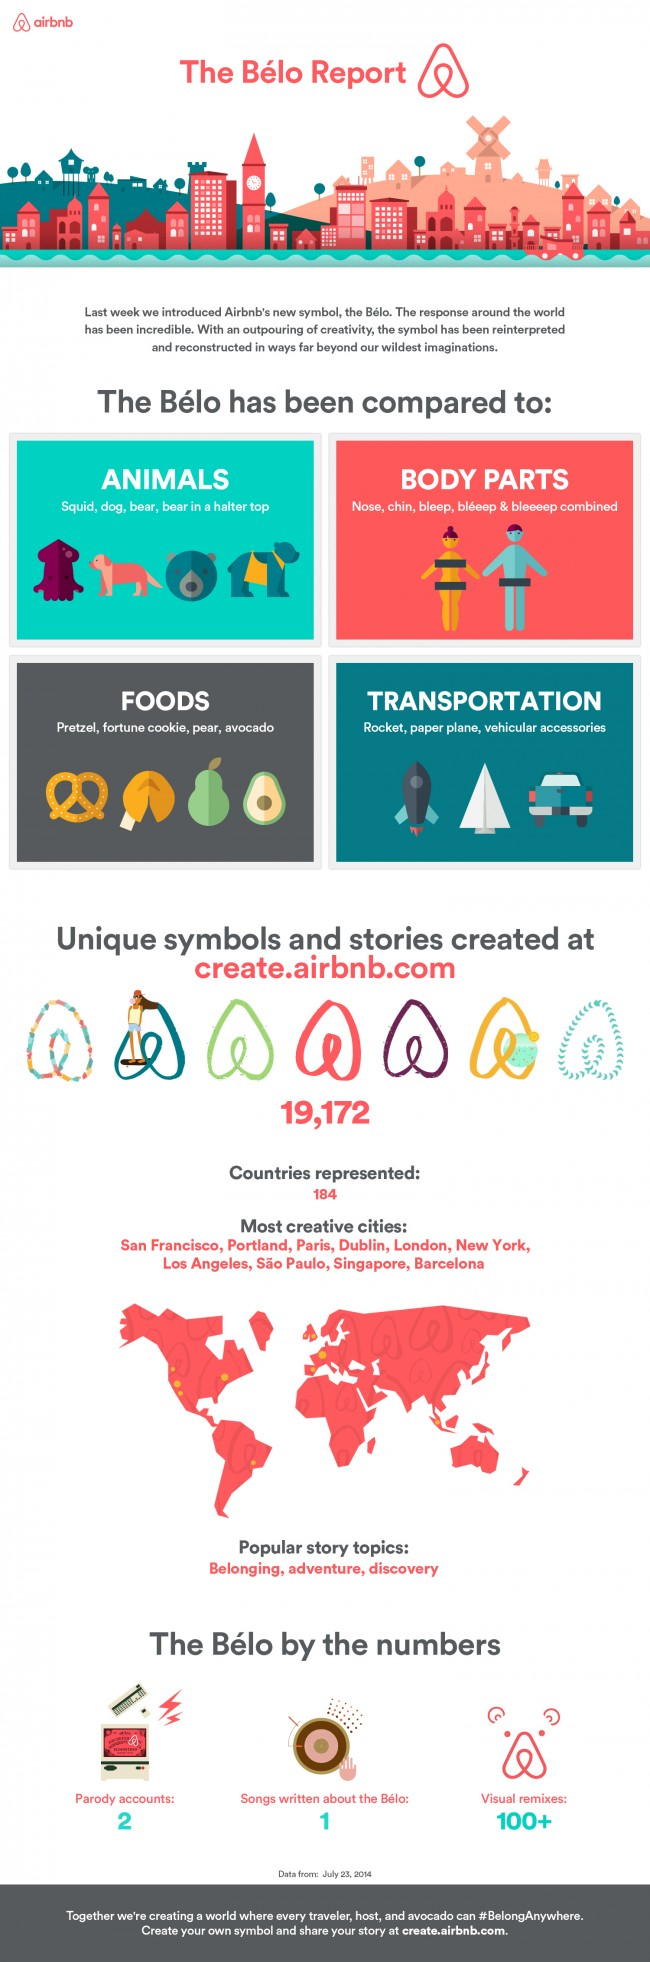 Airbnp3